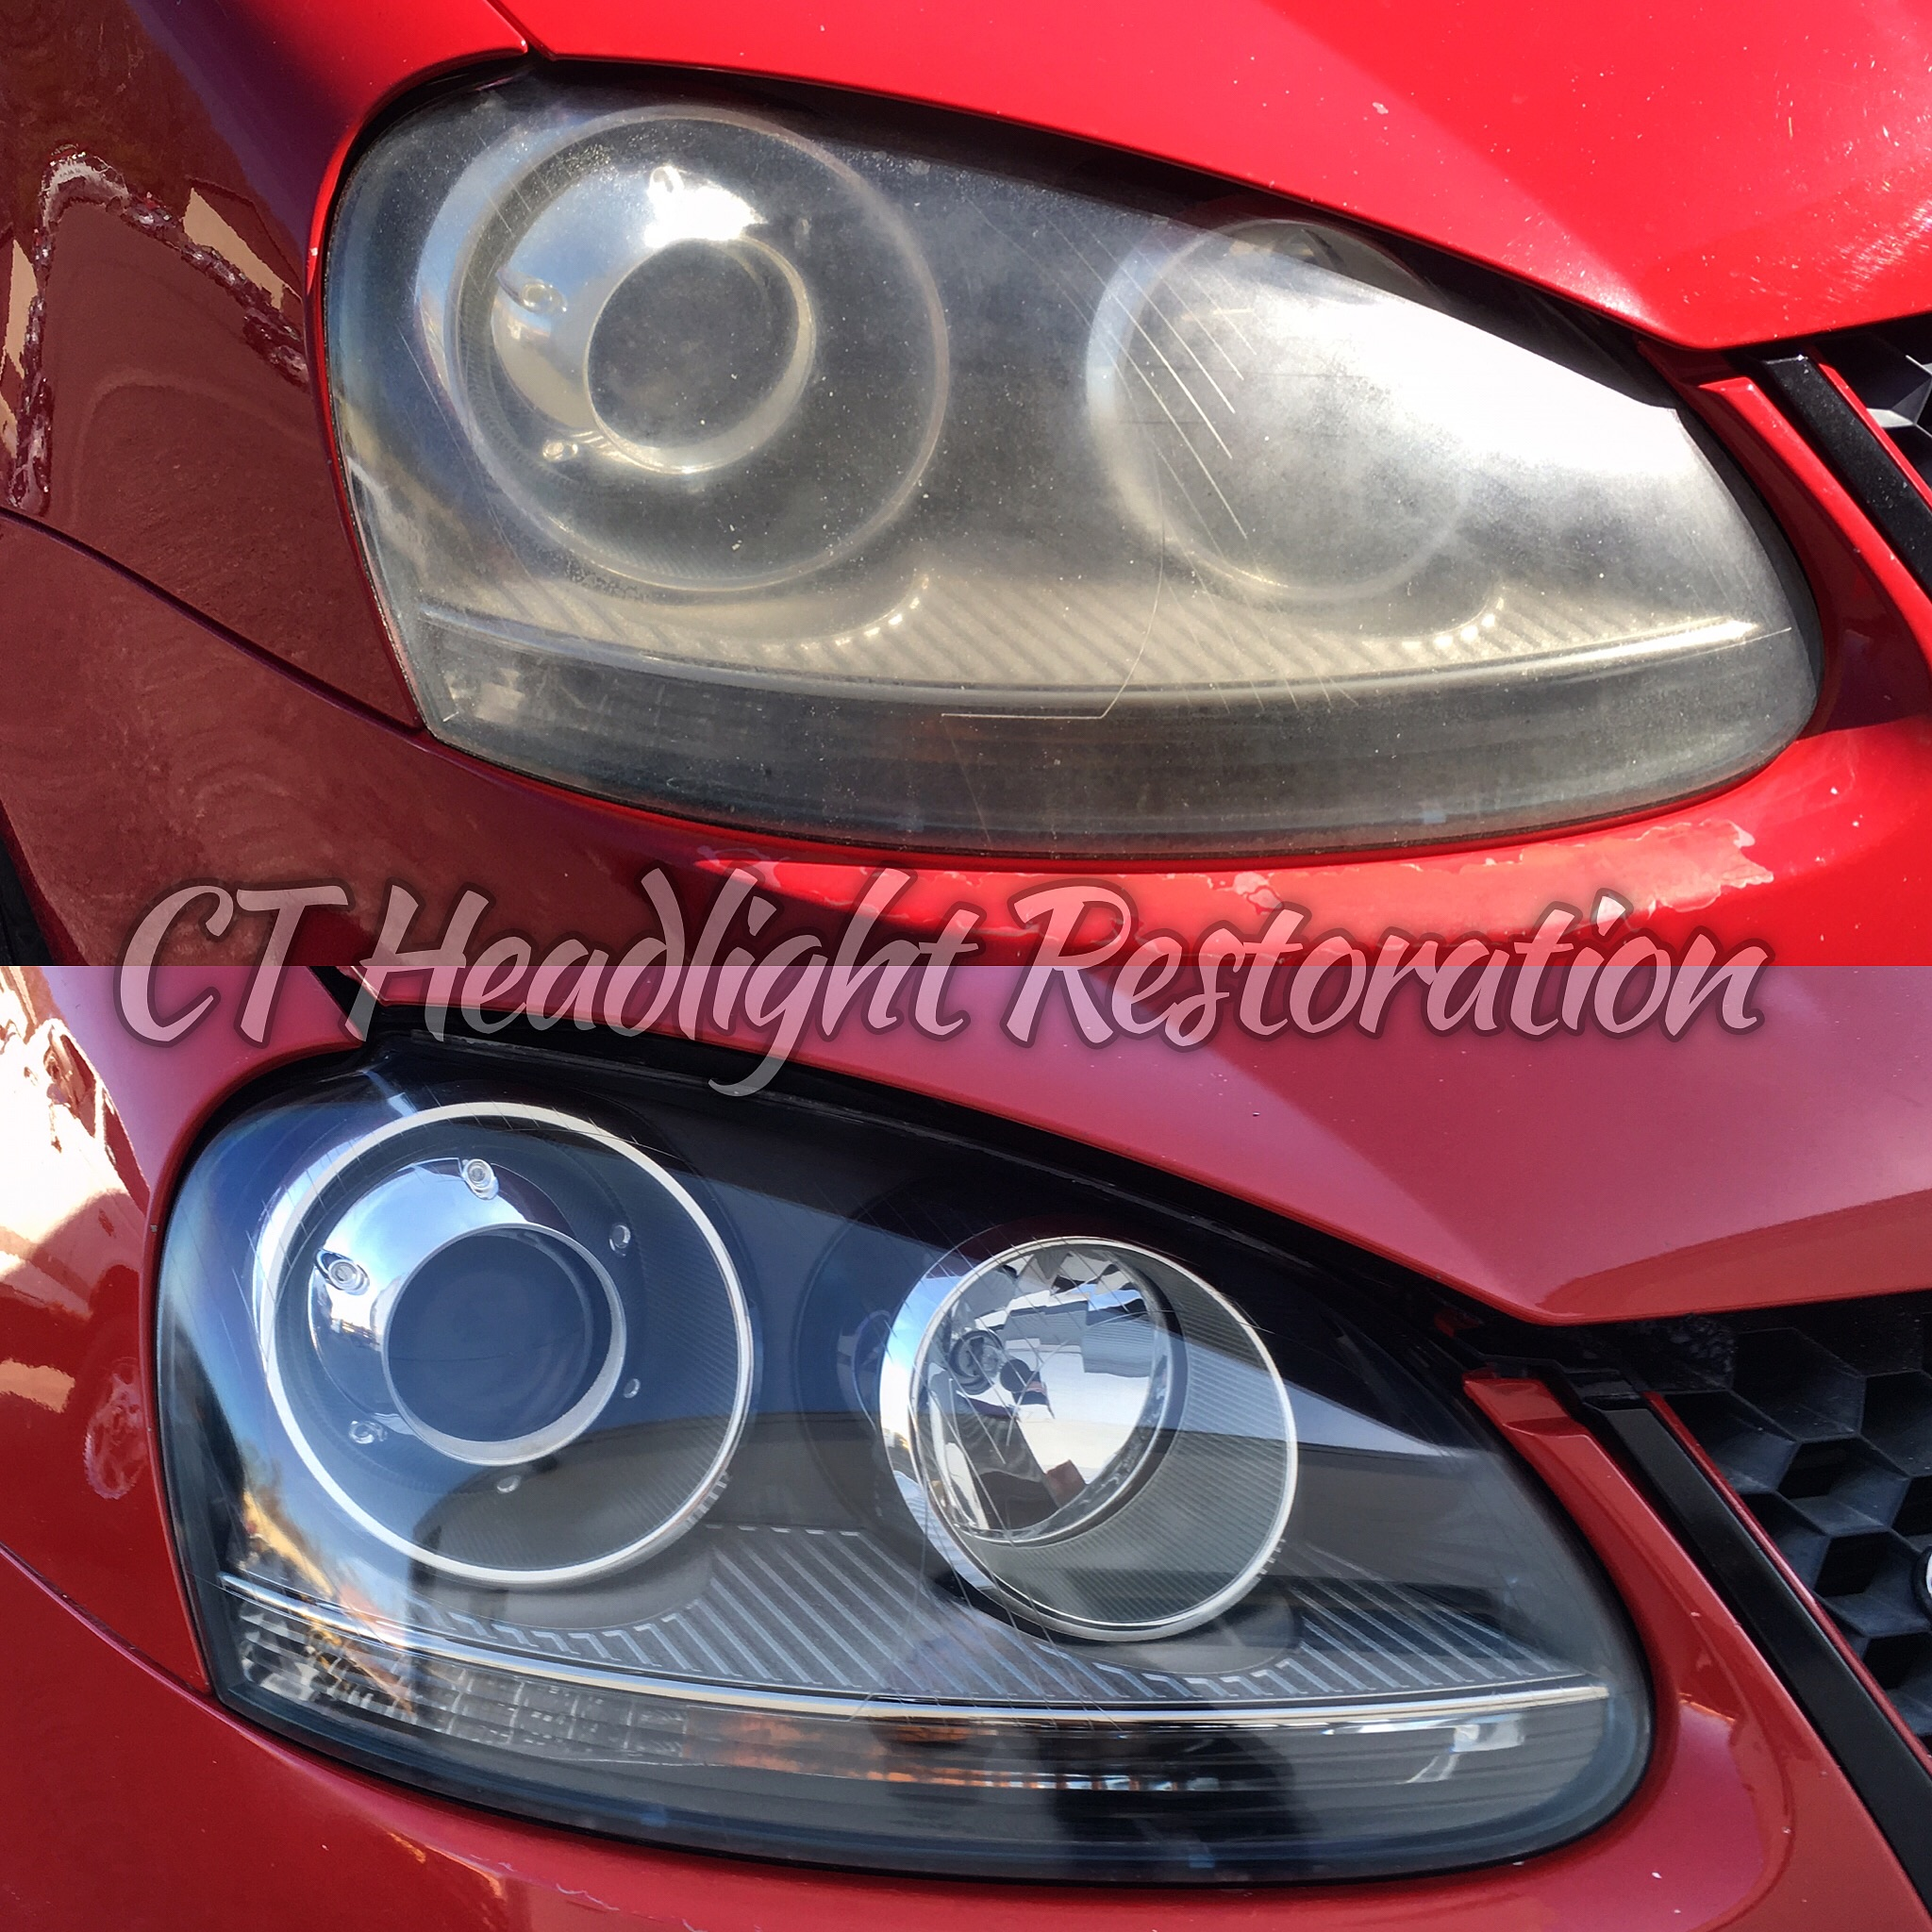 Volkswagon GTi Headlights Restoration.jpg